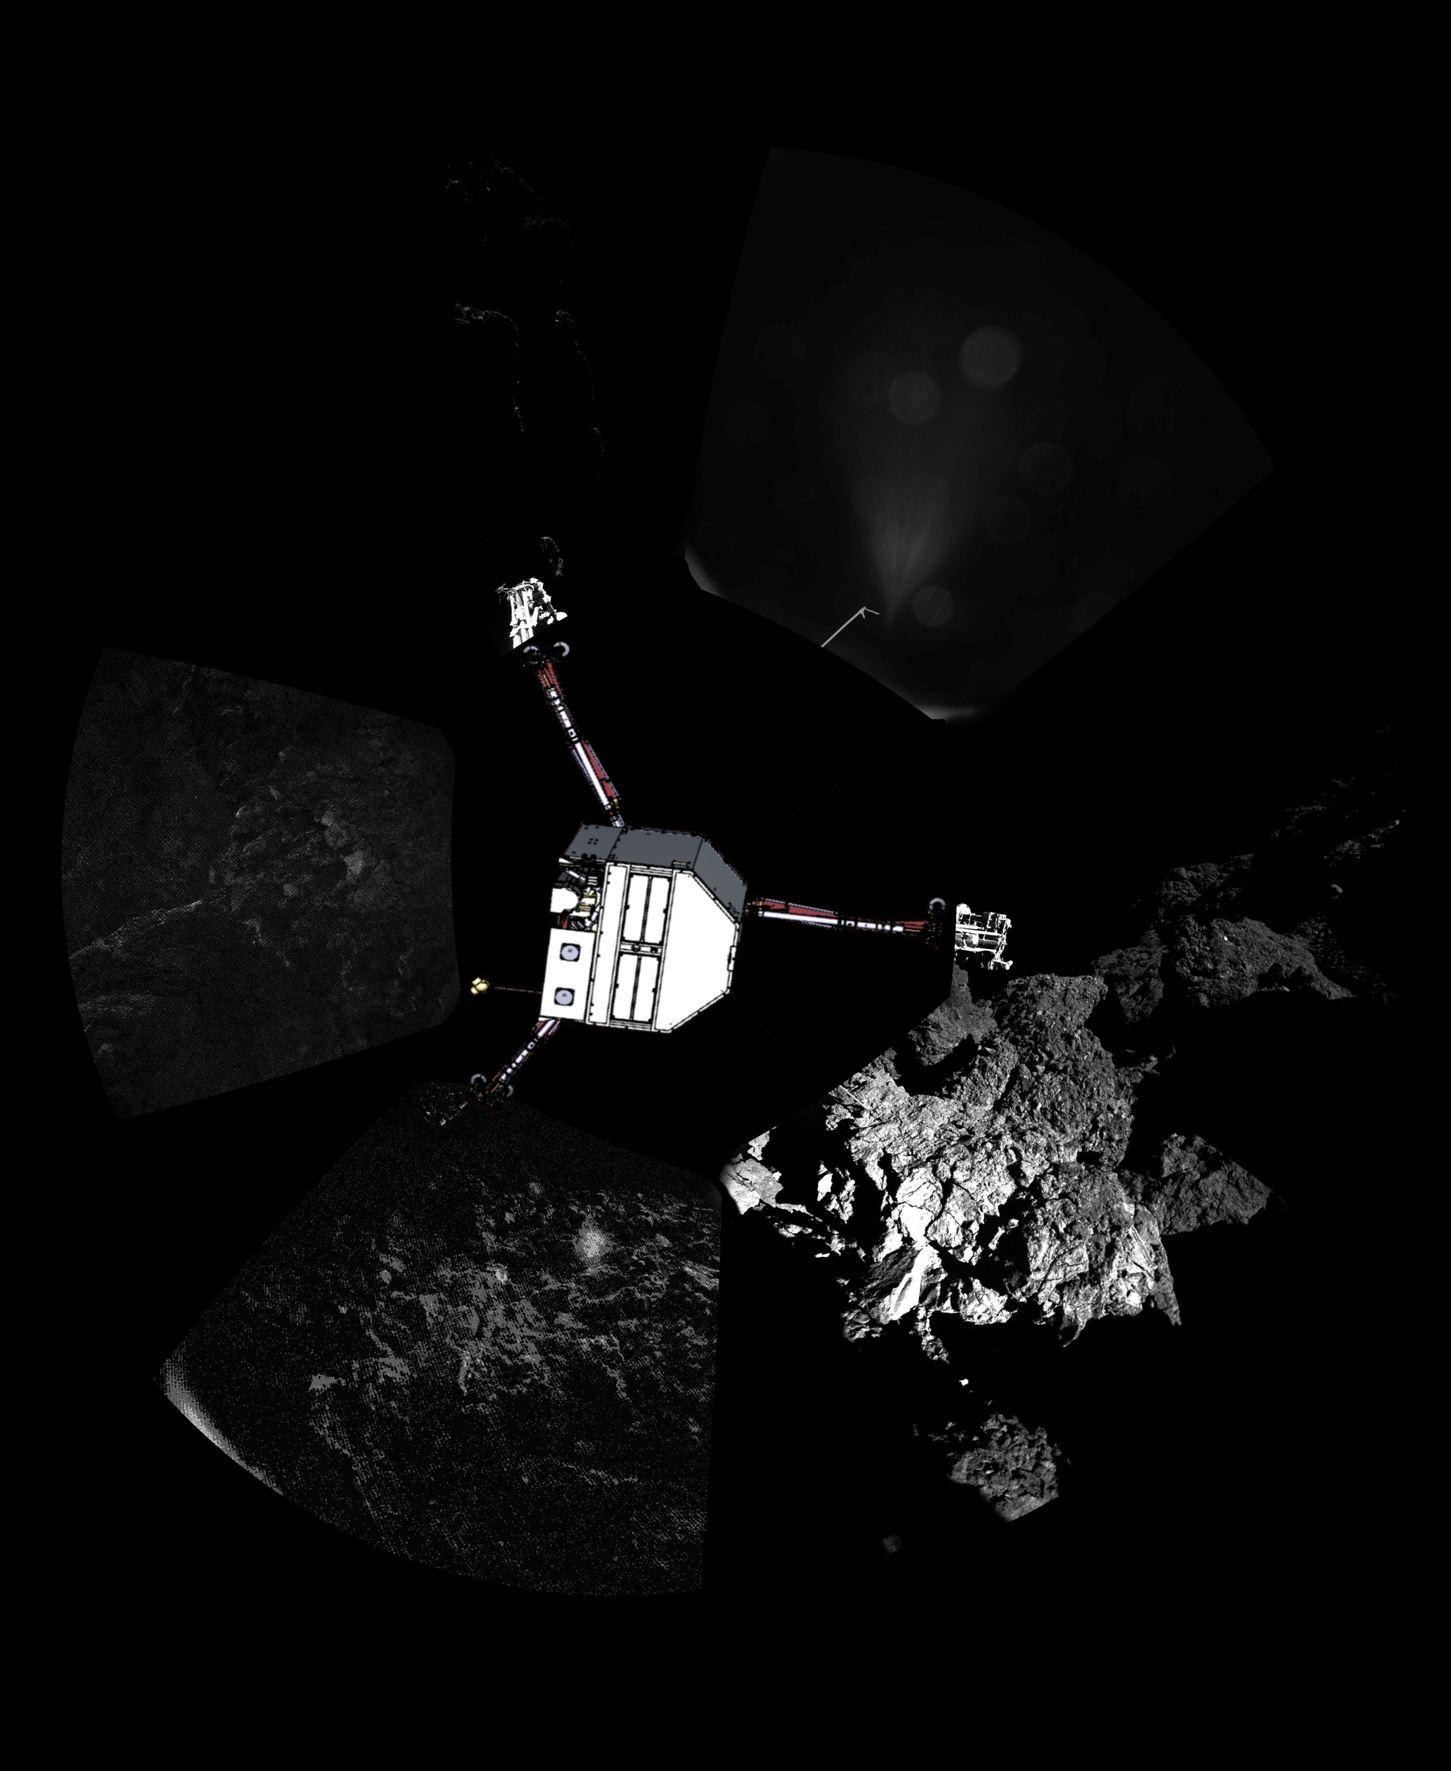 p11565_4c37a86064fe15003965c5a2bc5960eaComet_panoramic_lander_orientation.jpg